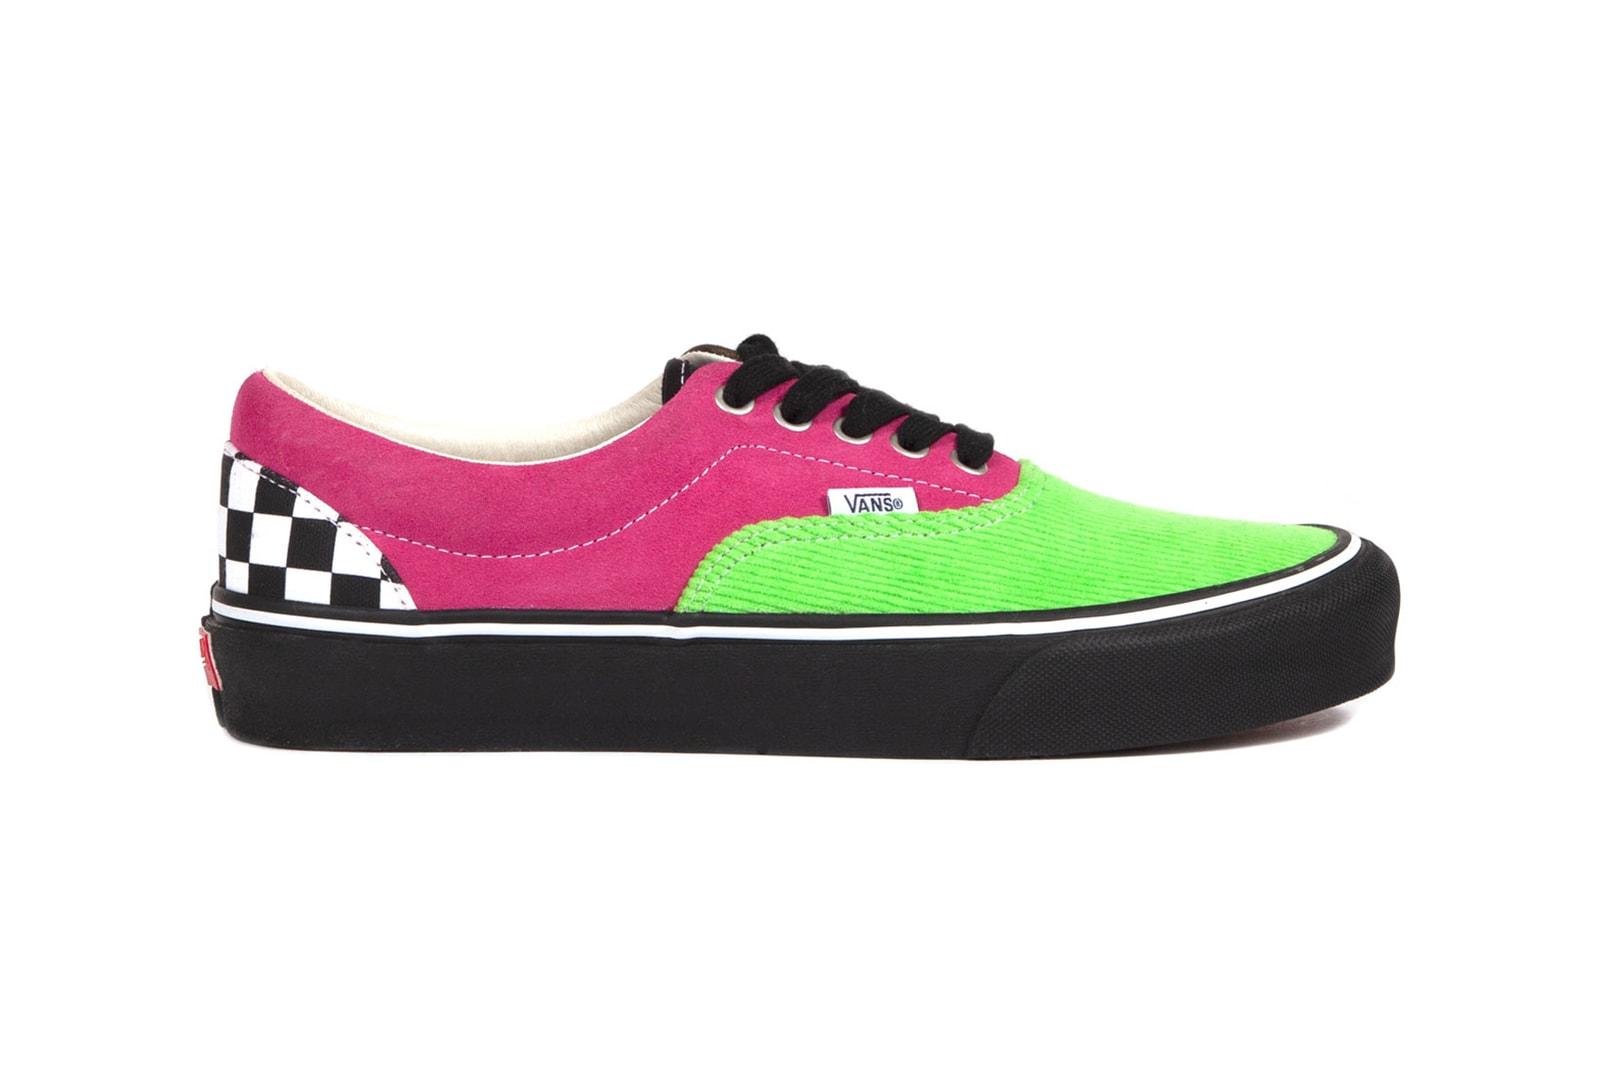 noah vans authentic og era lx collaboration suede corduroy fall winter sneakers release